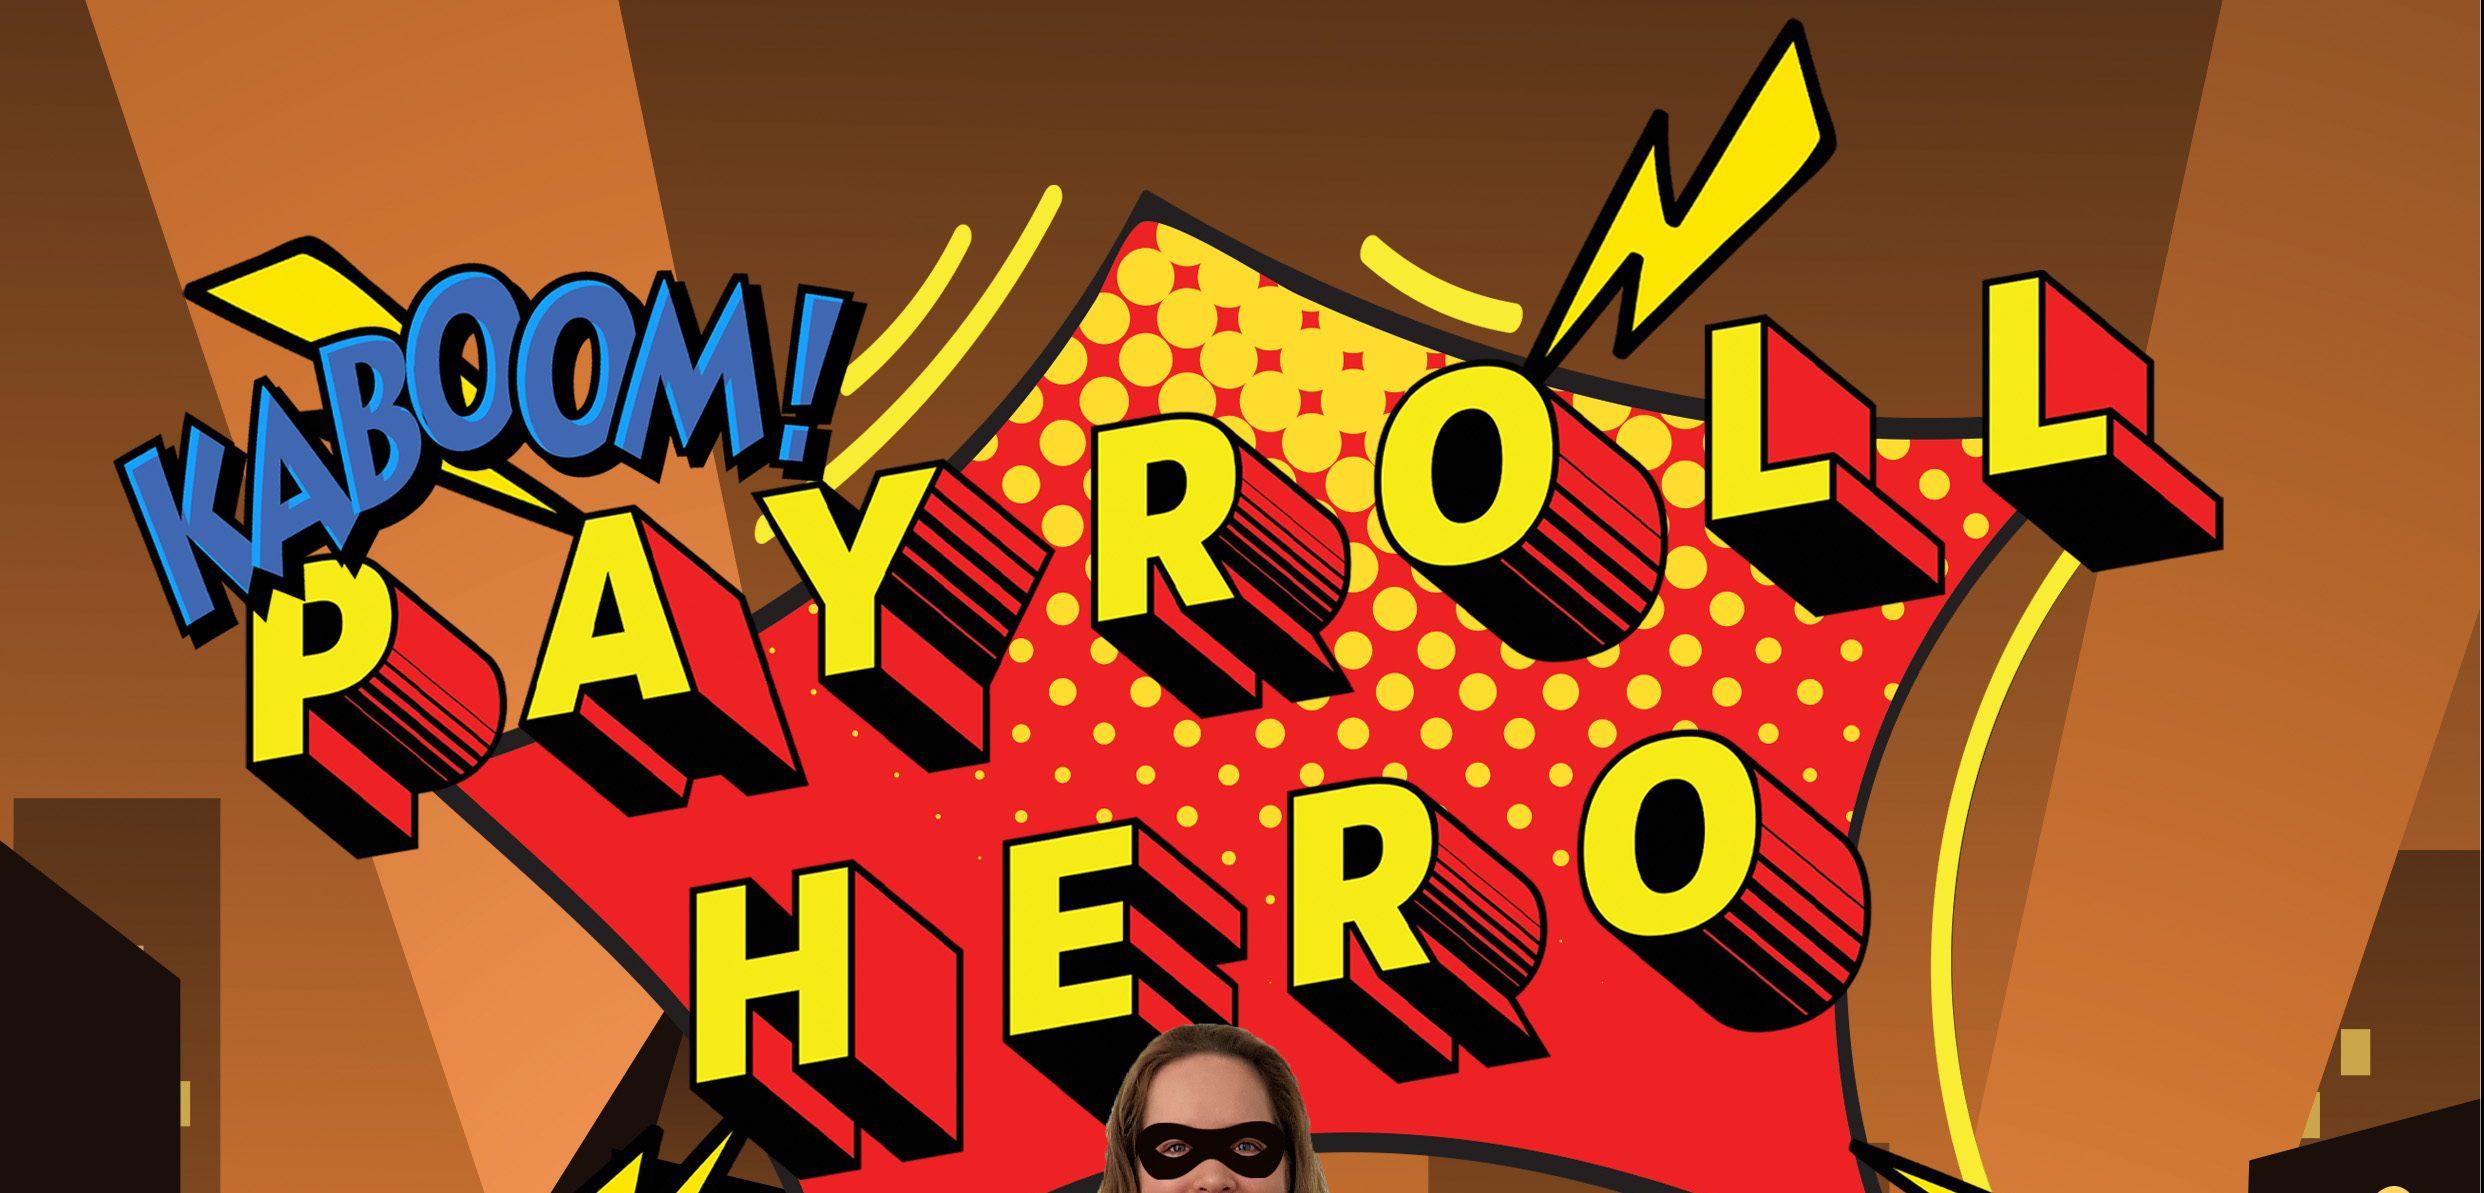 payroll heroin marijke